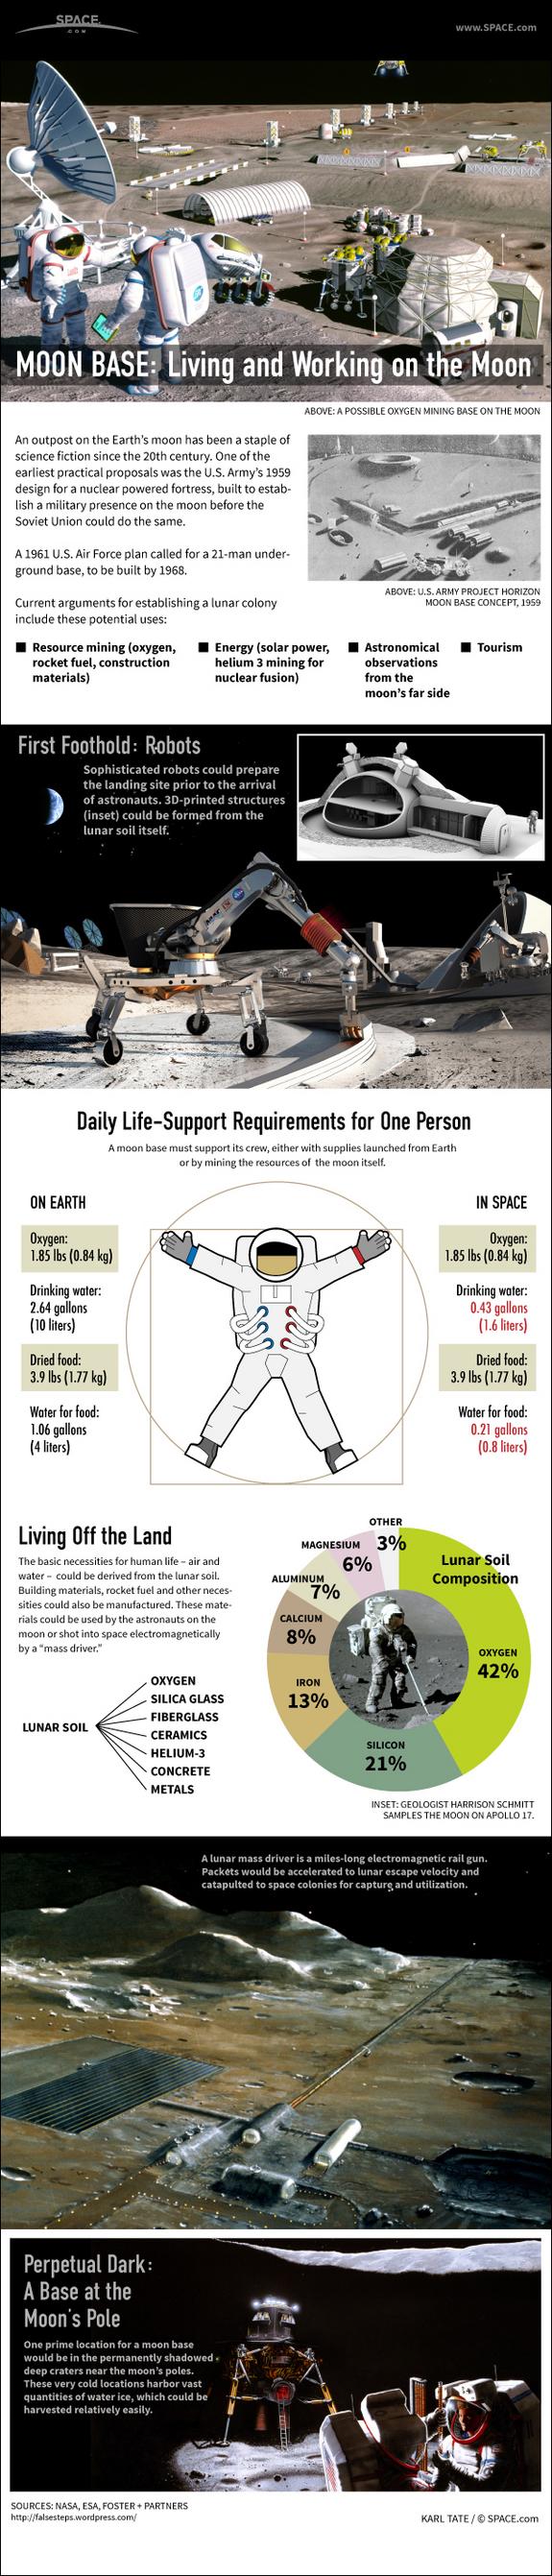 Лунарна база: Живот и работа на Месечината